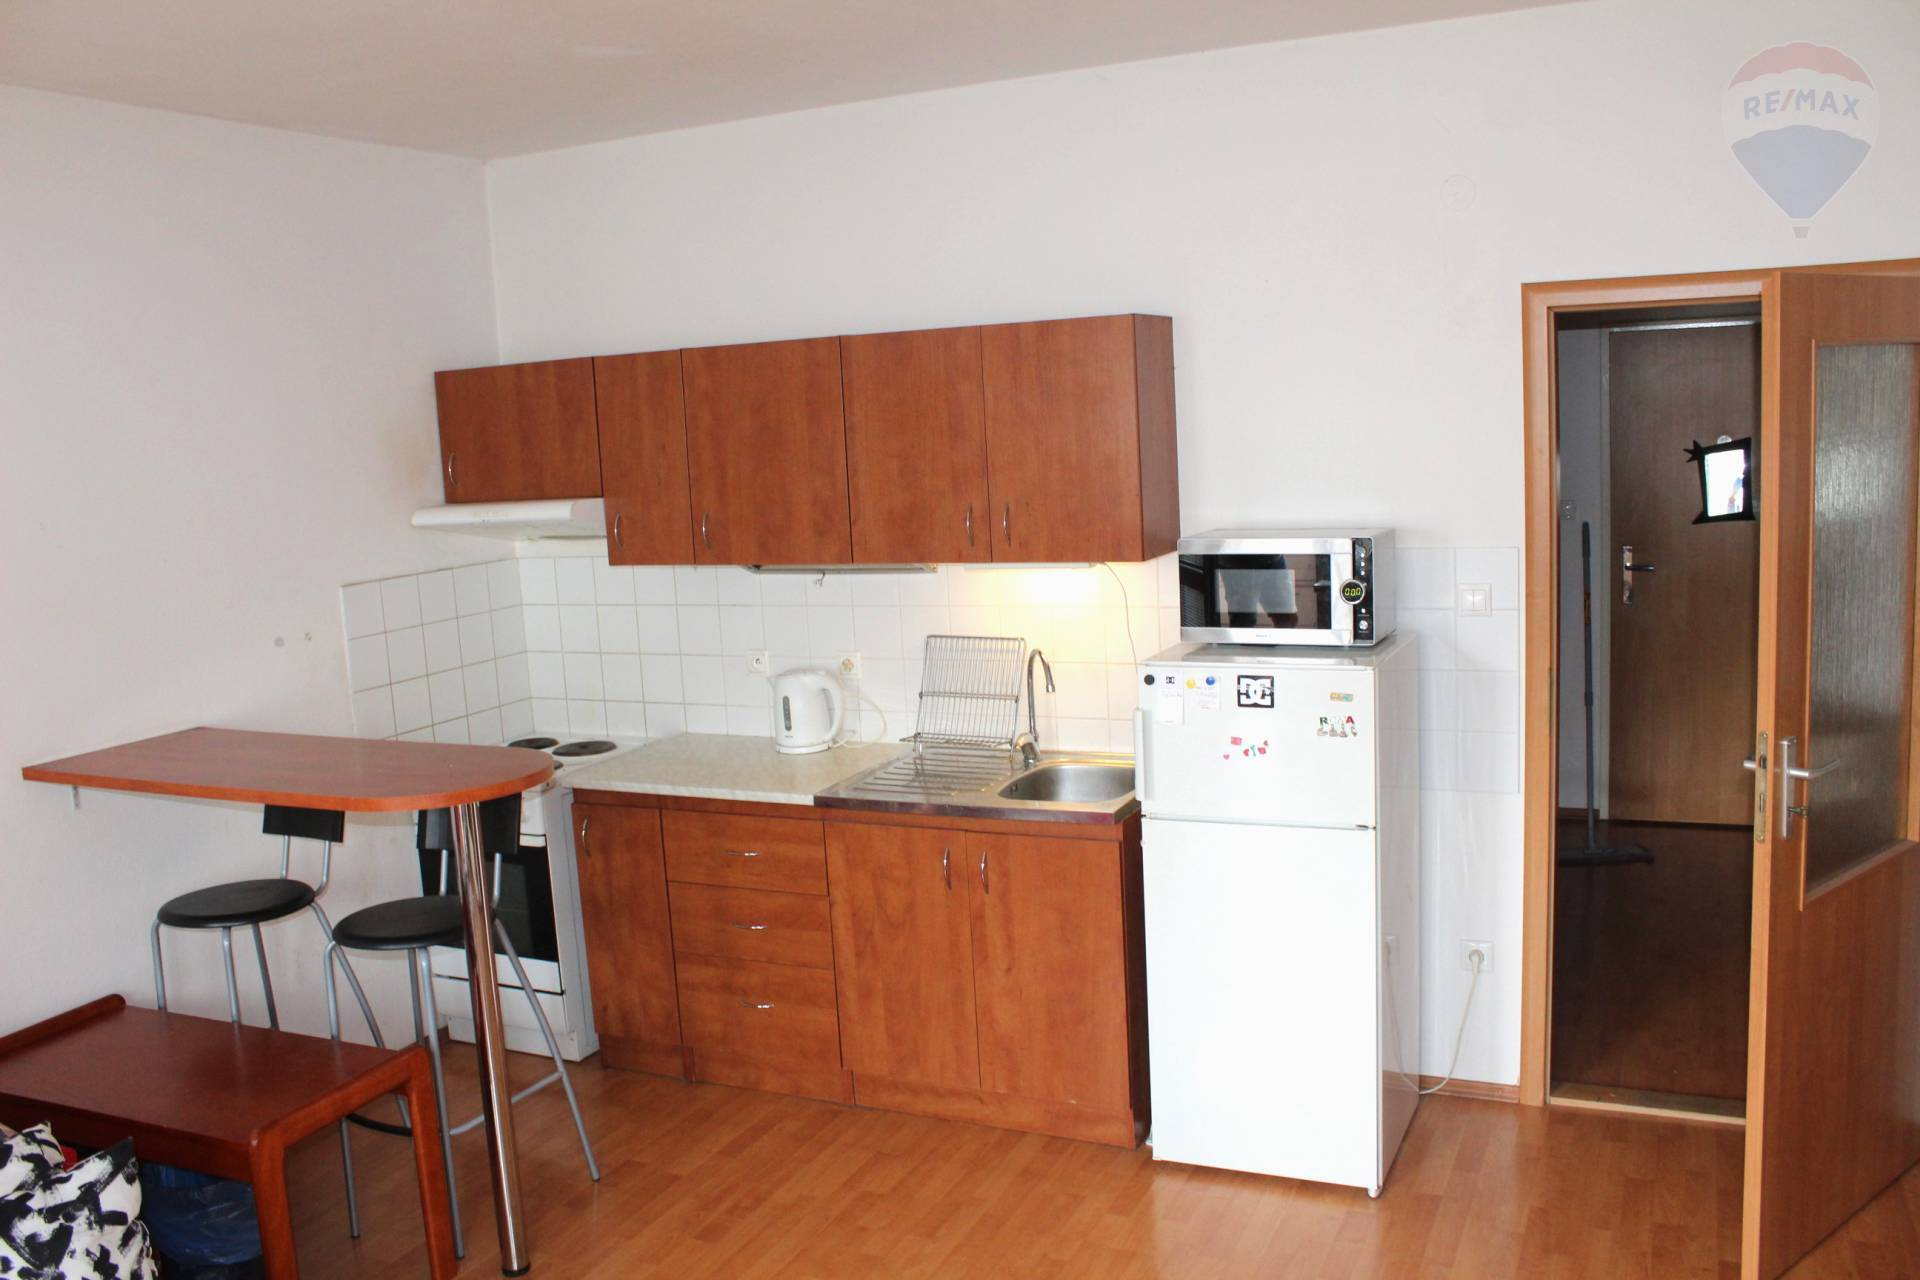 Predaj bytu (1 izbový) 38 m2, Bratislava - Petržalka -